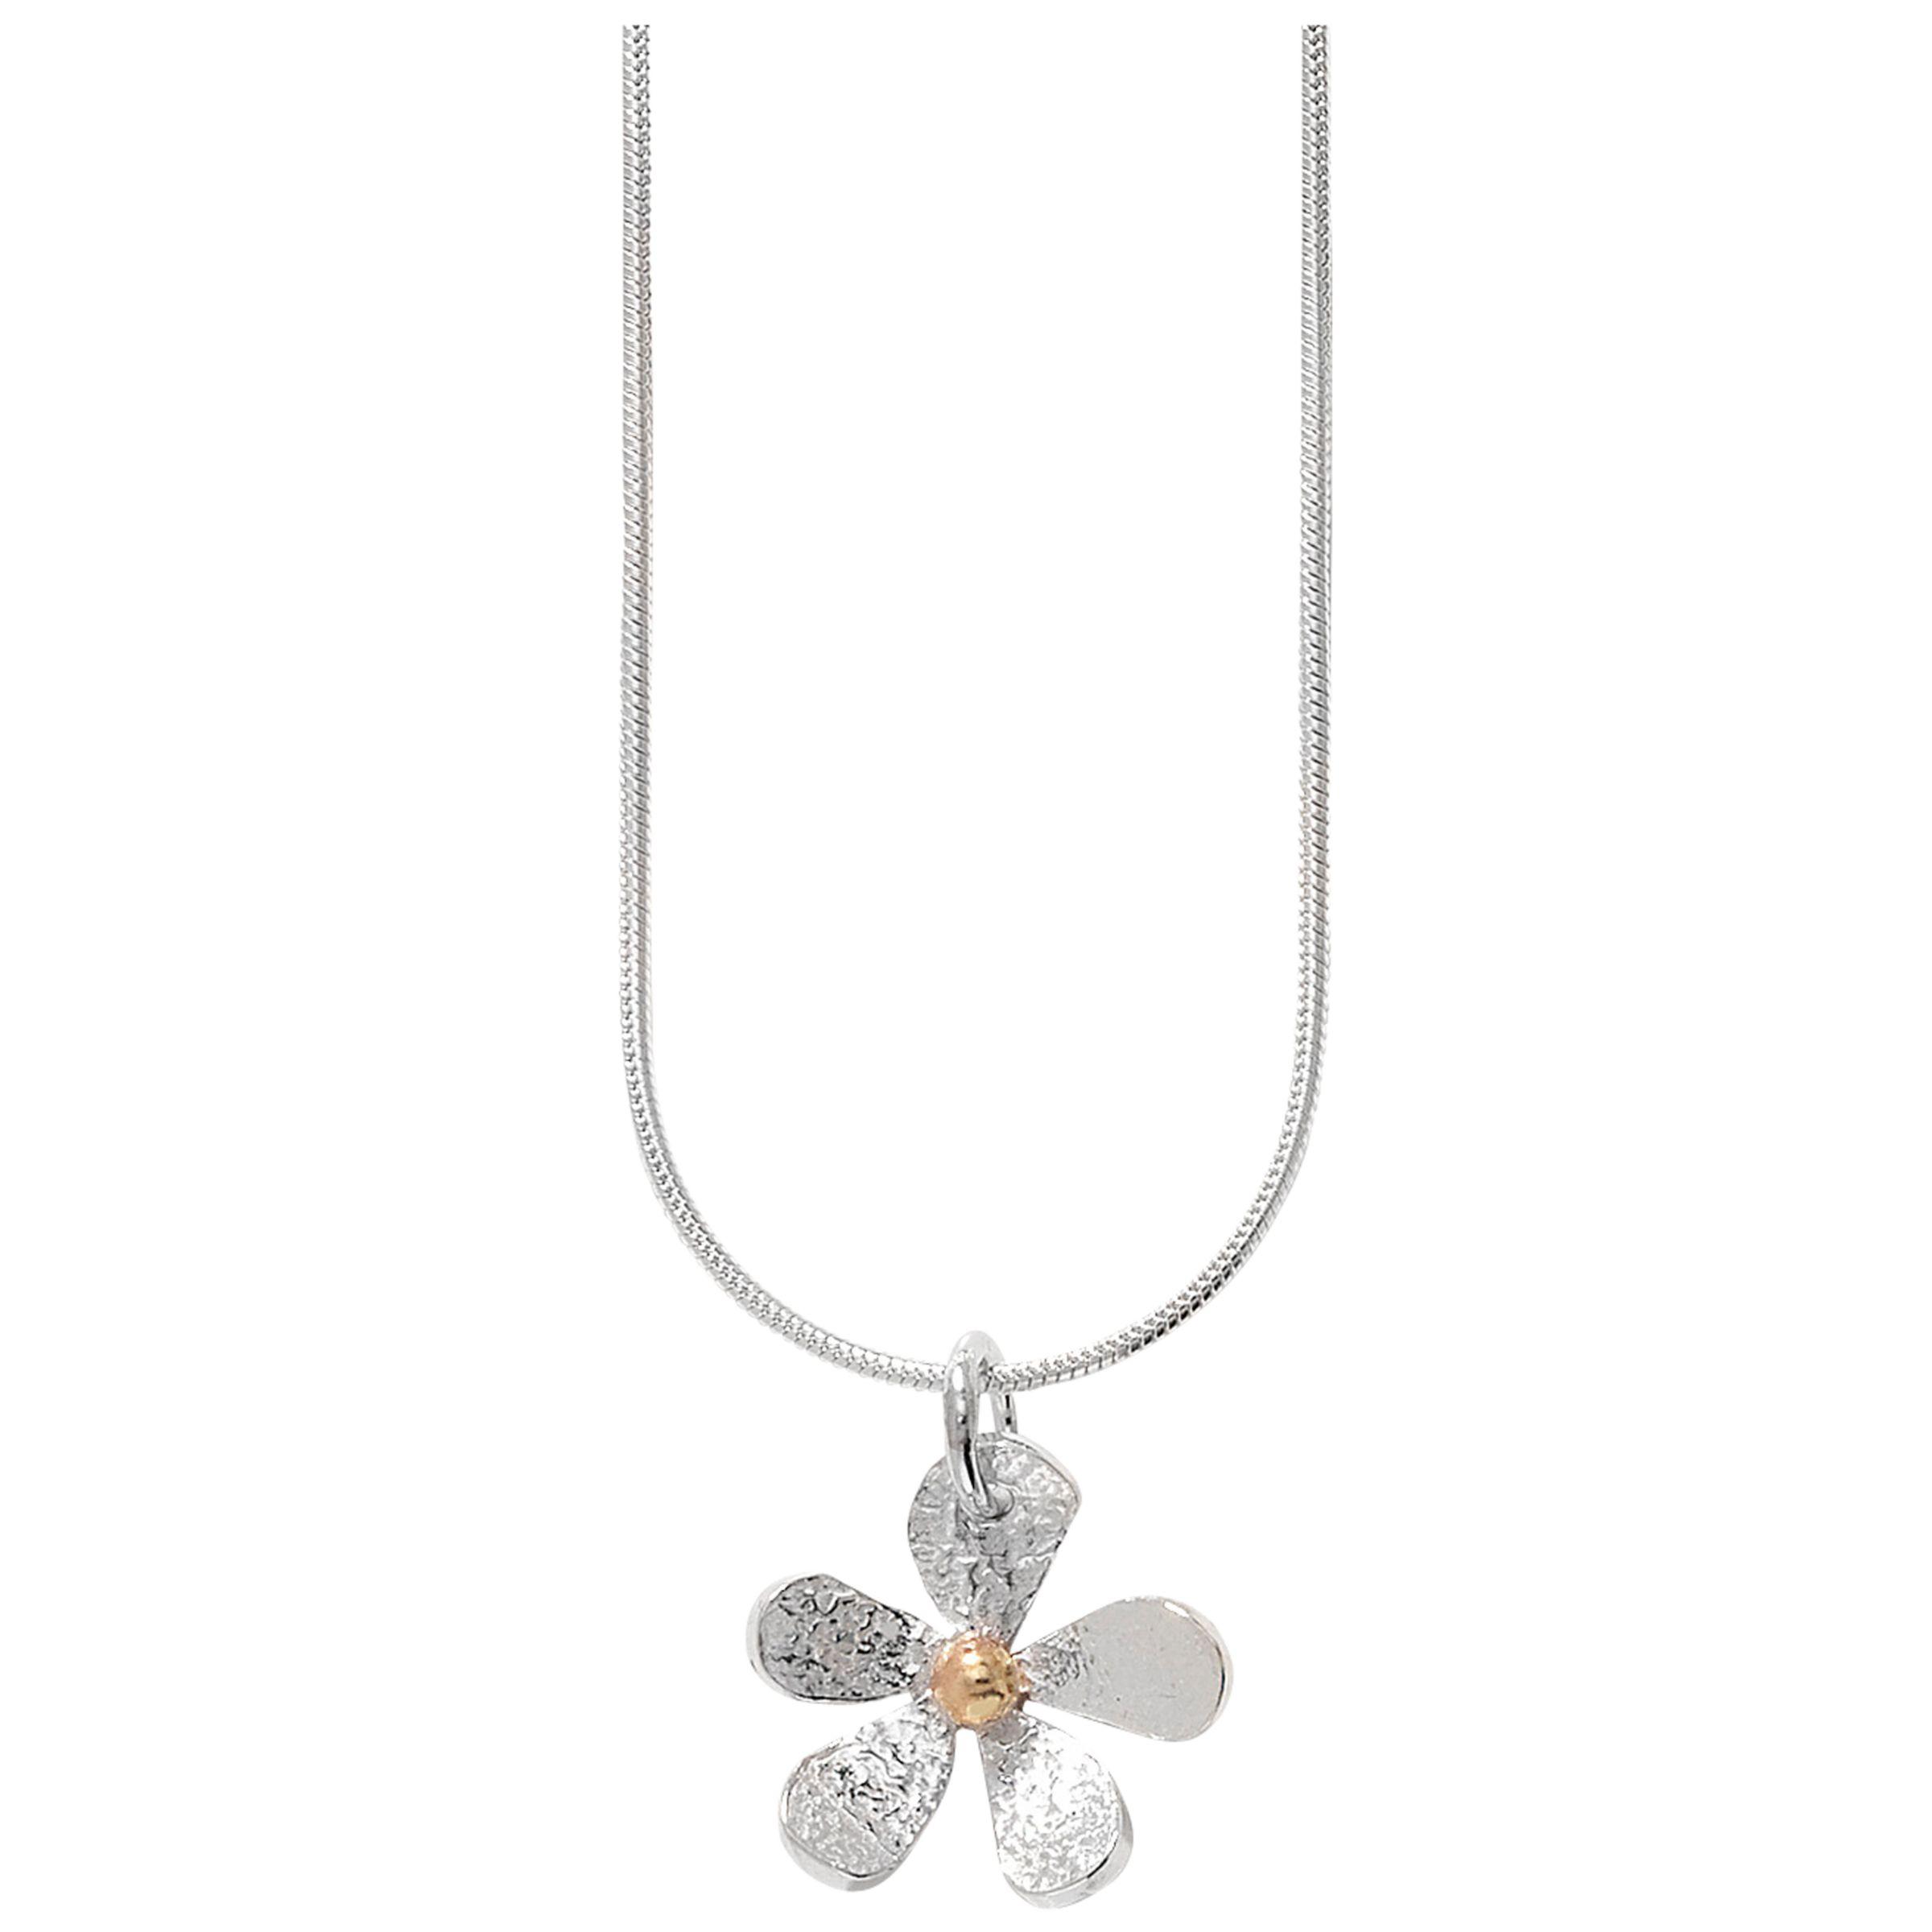 Linda Macdonald Daisy Necklace, Silver/Gold